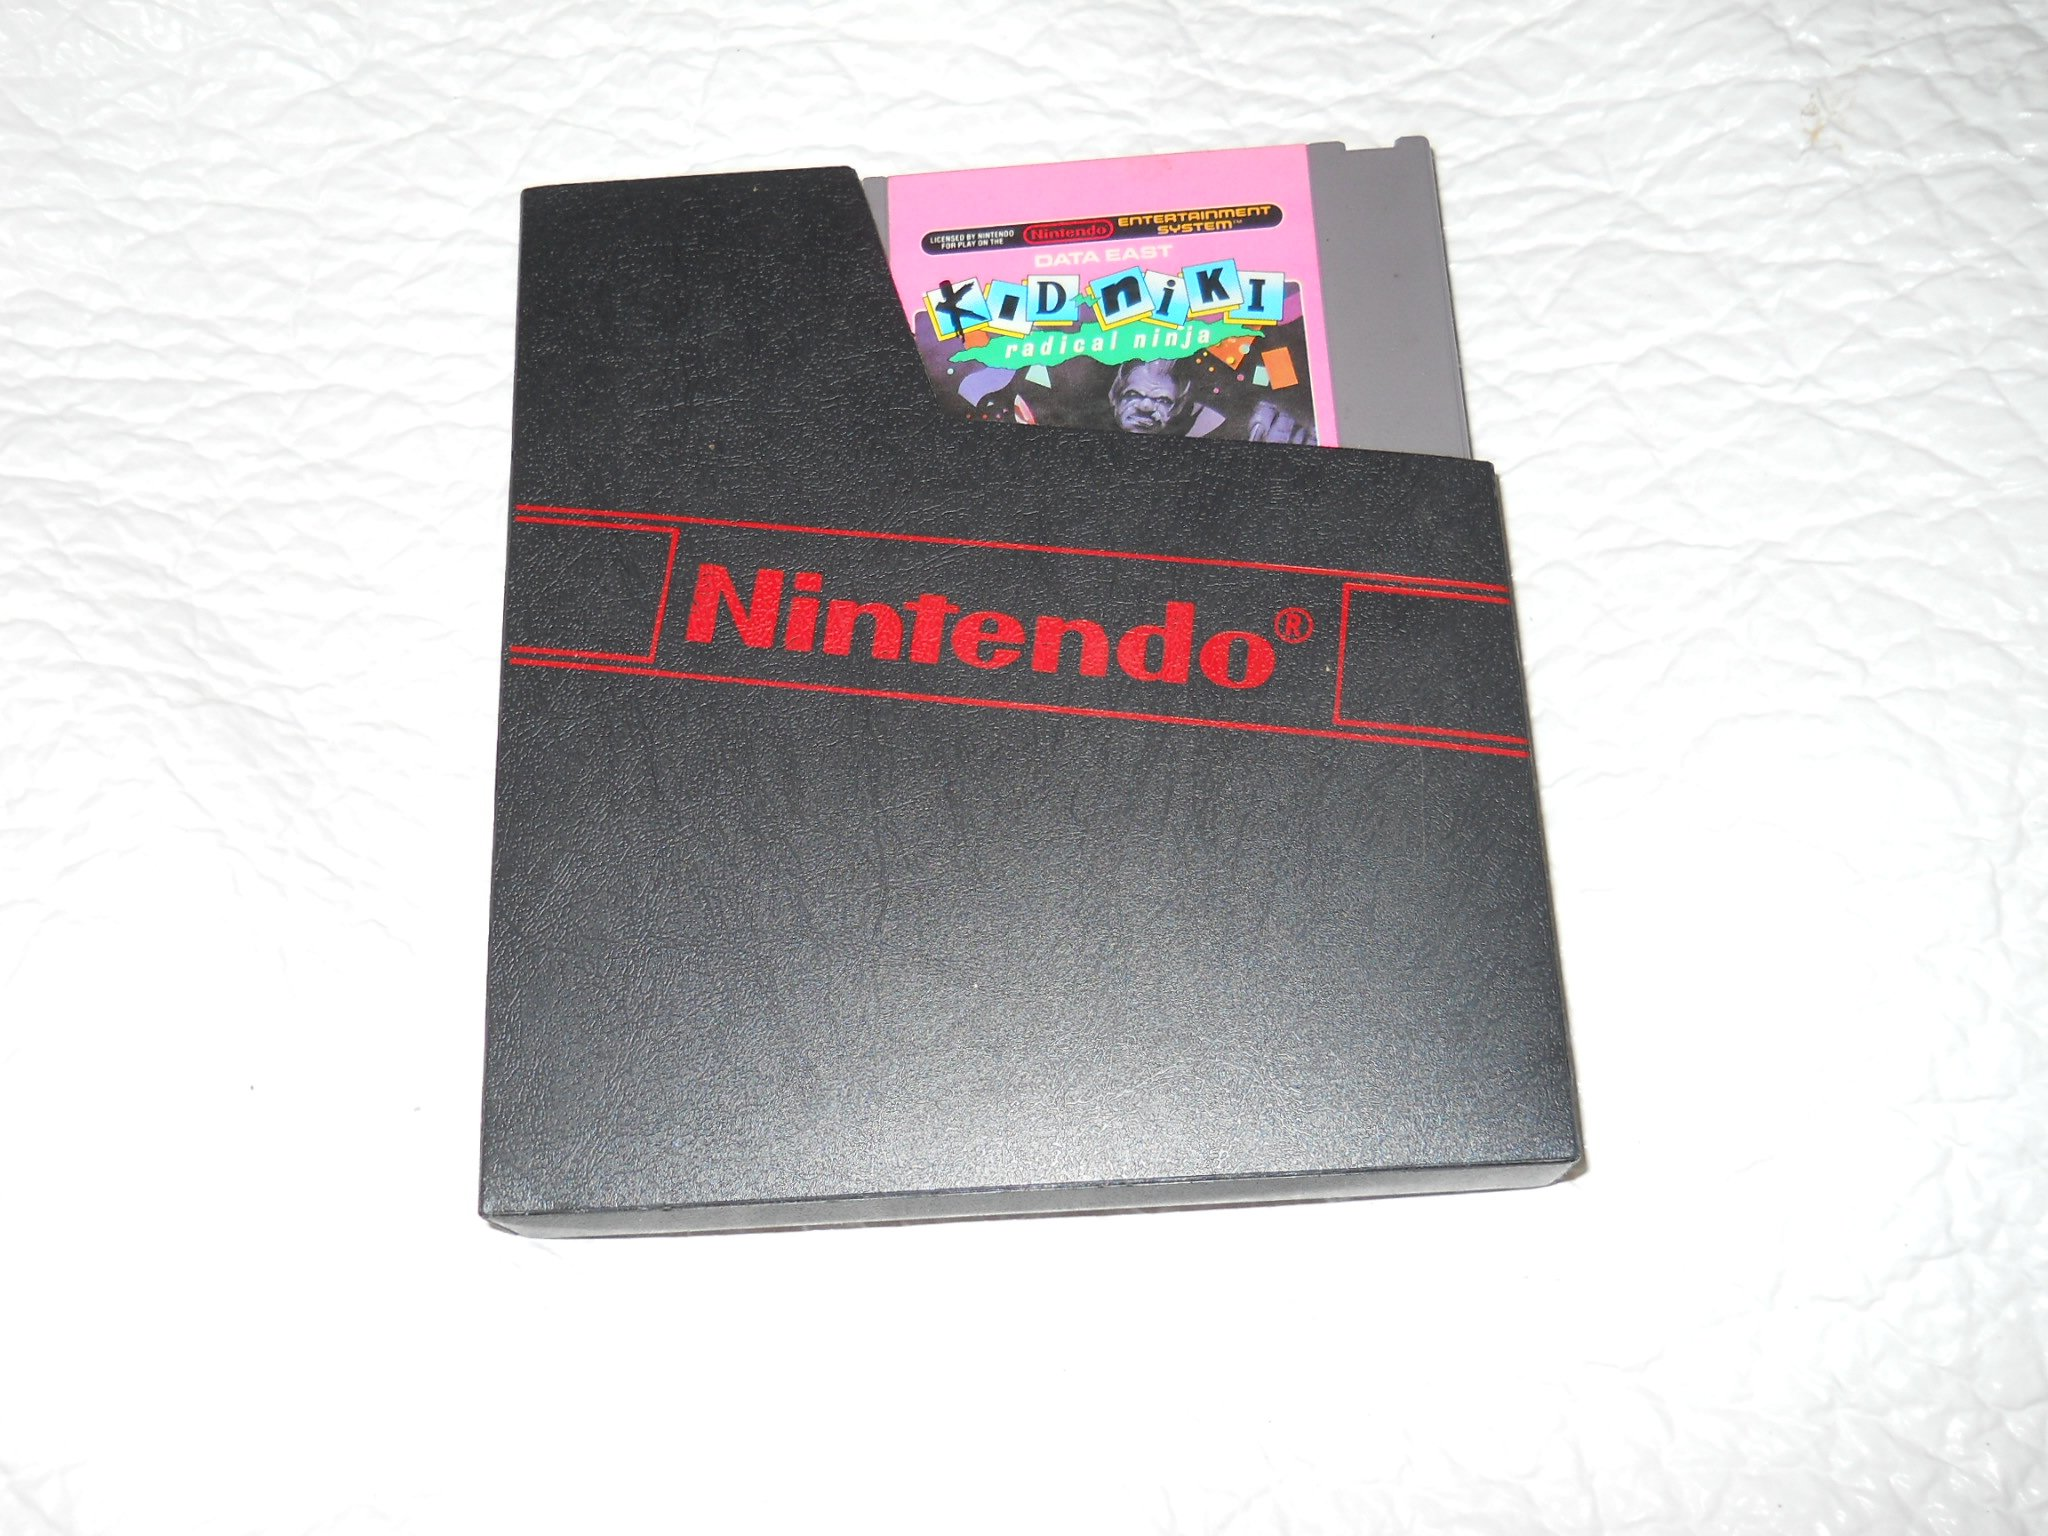 Amazon.com: Kid Niki Radical Ninja: Video Games